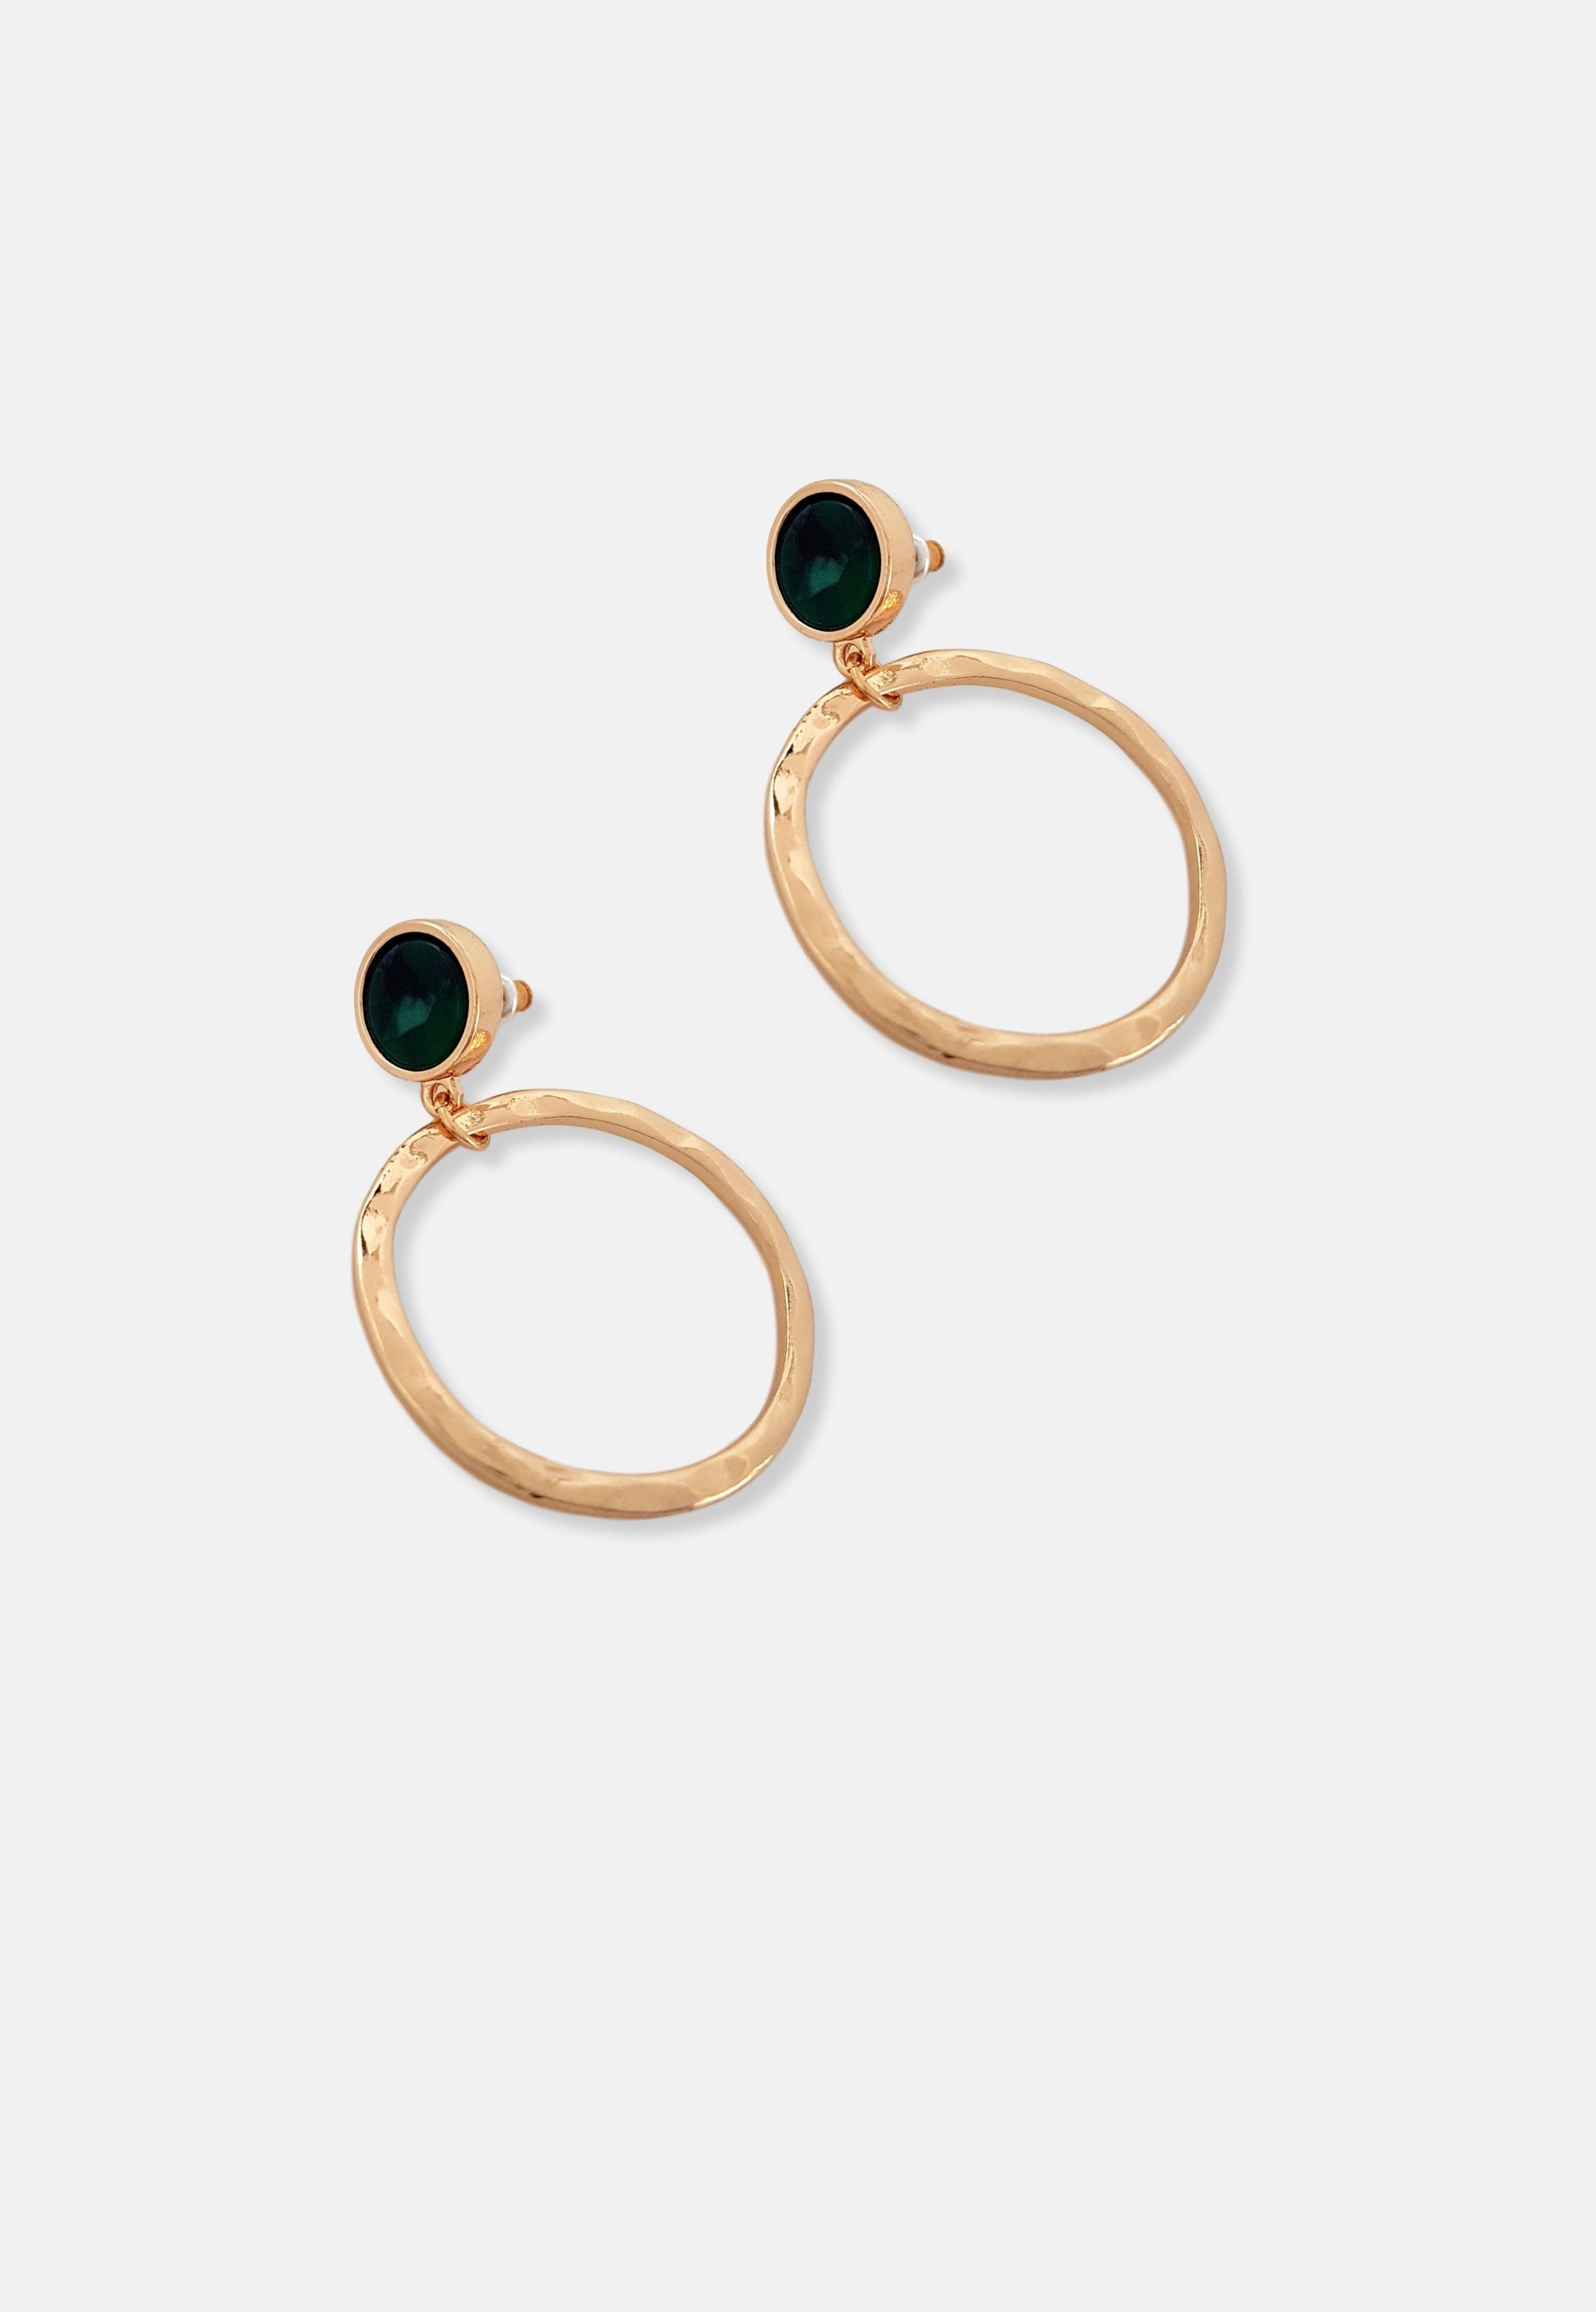 Missguided - Emerald Resin Ring Earrings, Women